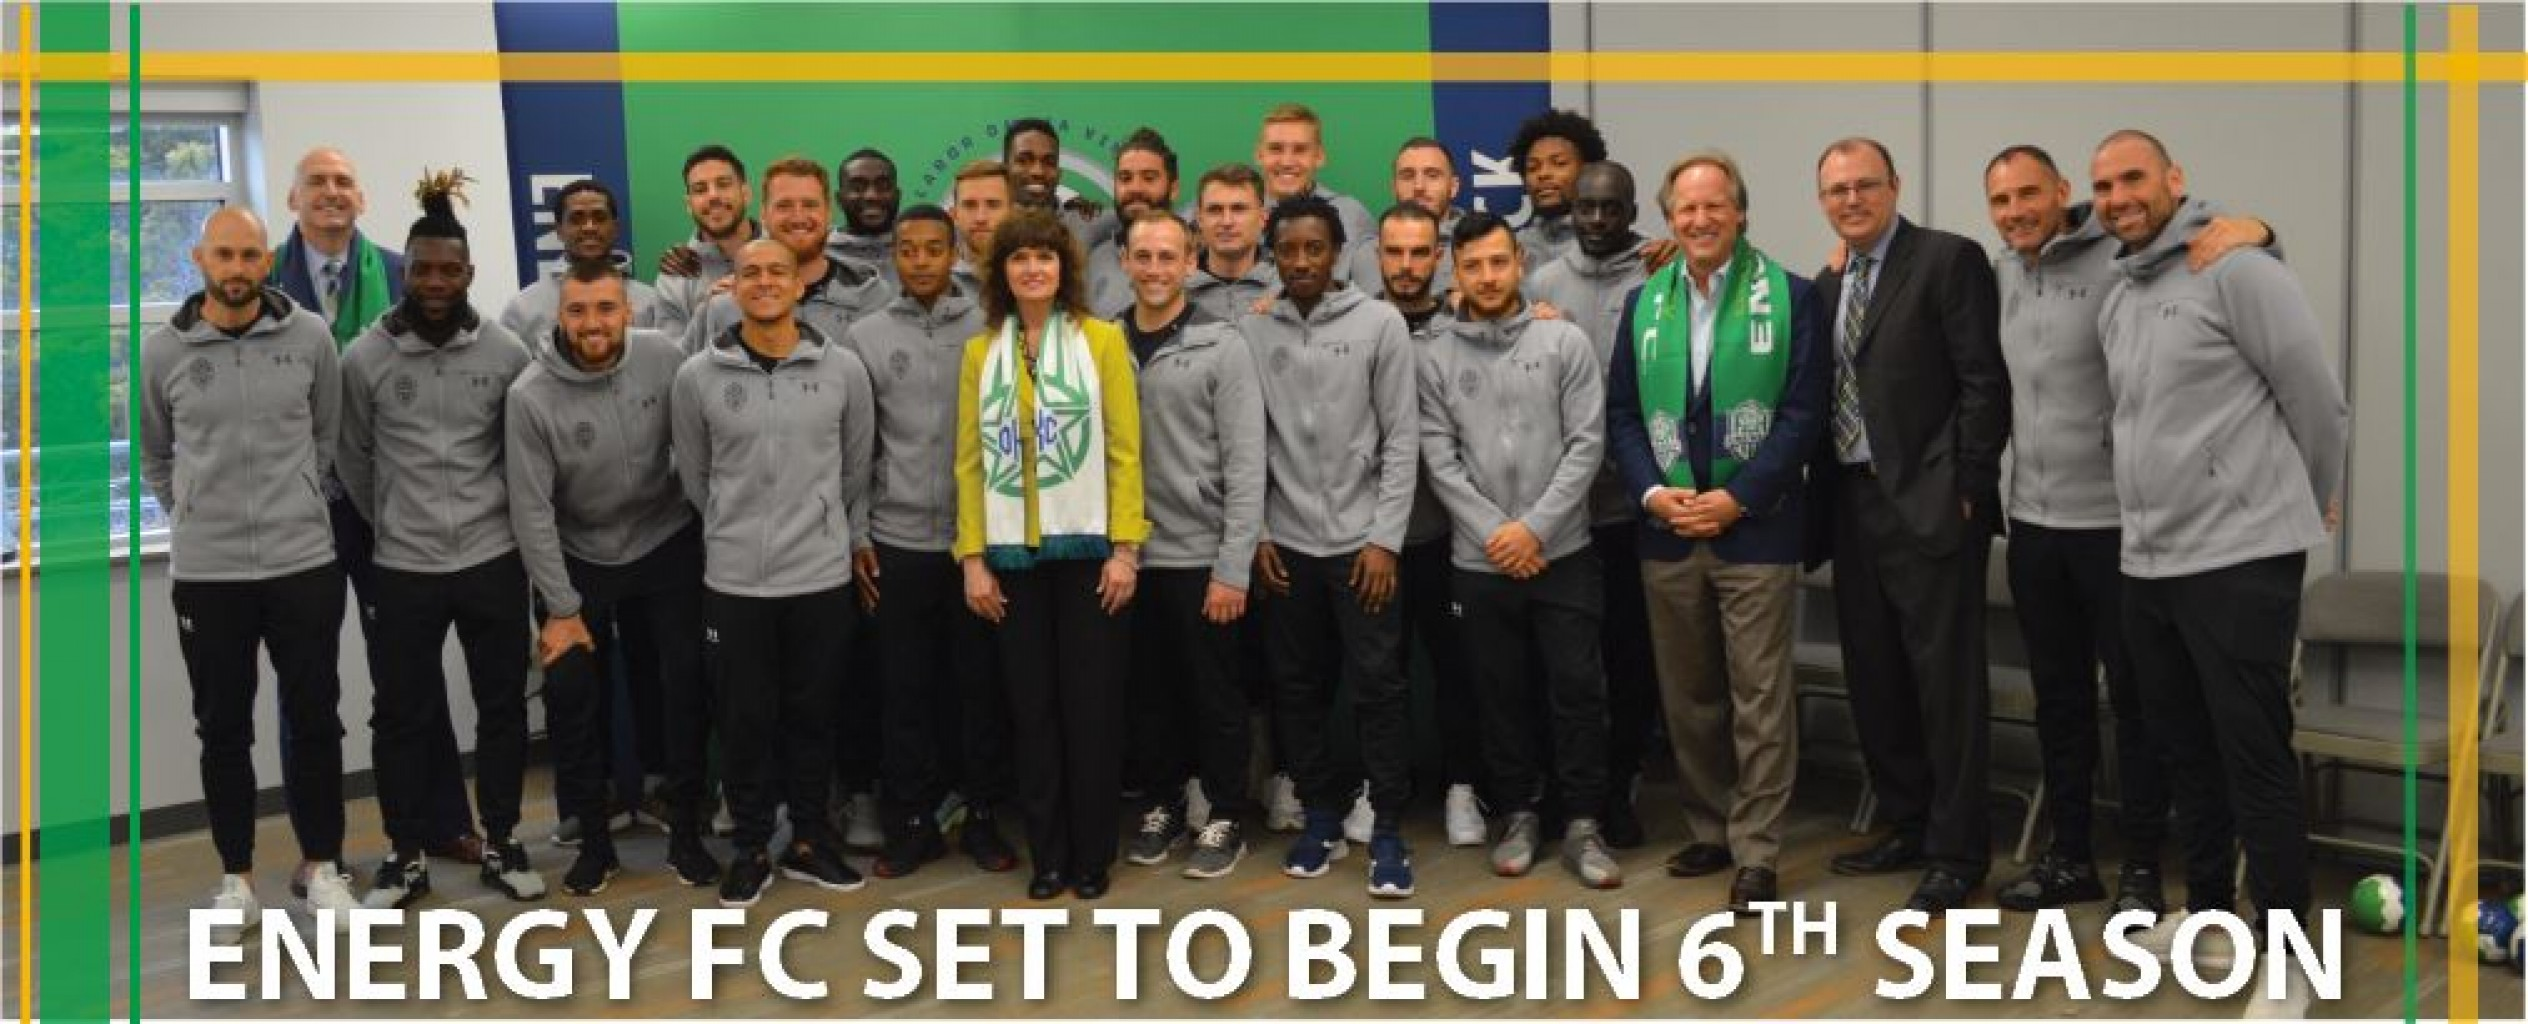 ENERGY FC SET TO BEGIN 6TH SEASON